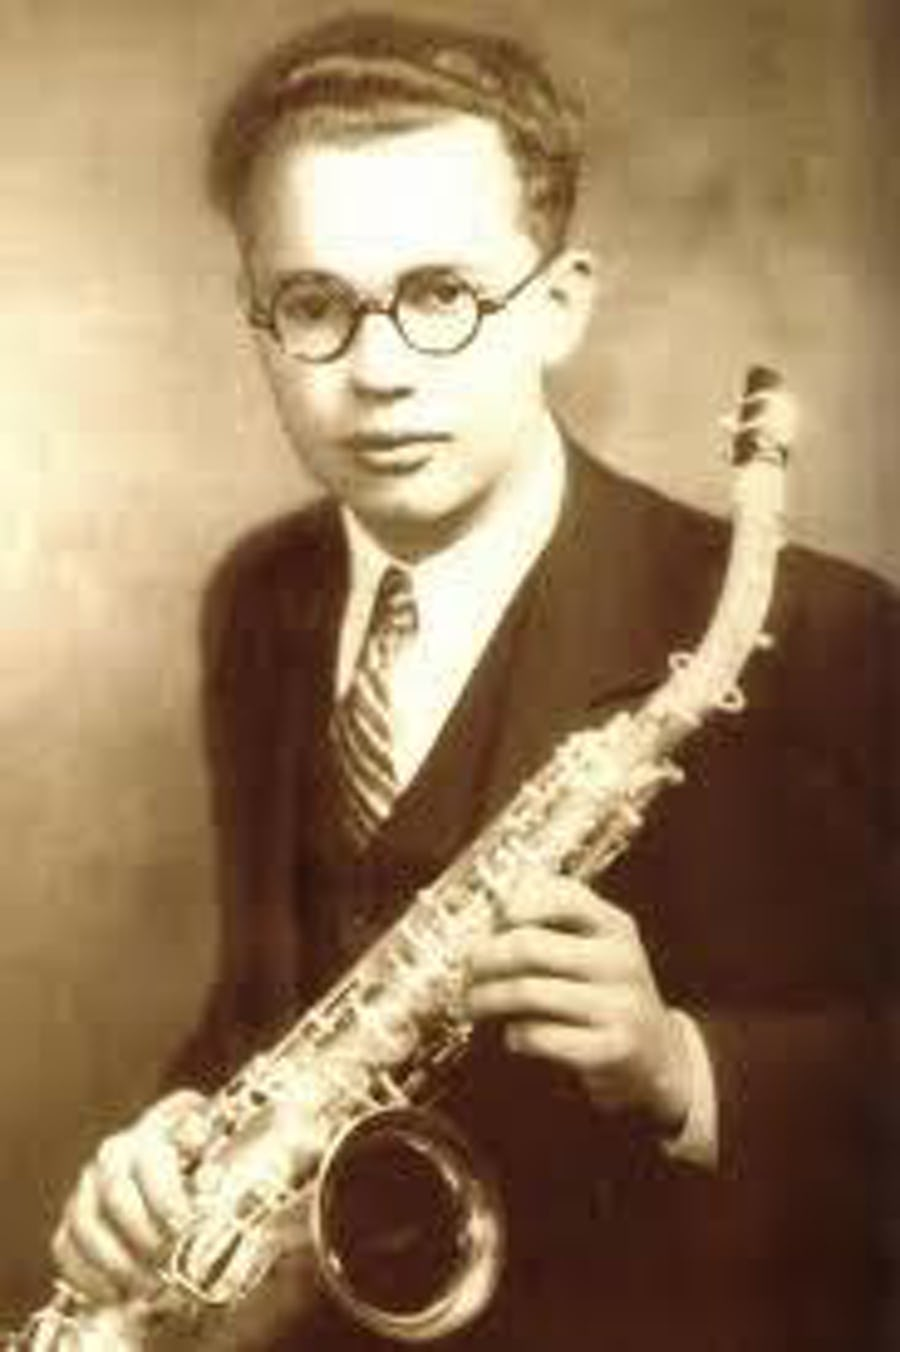 A young Leo Fender